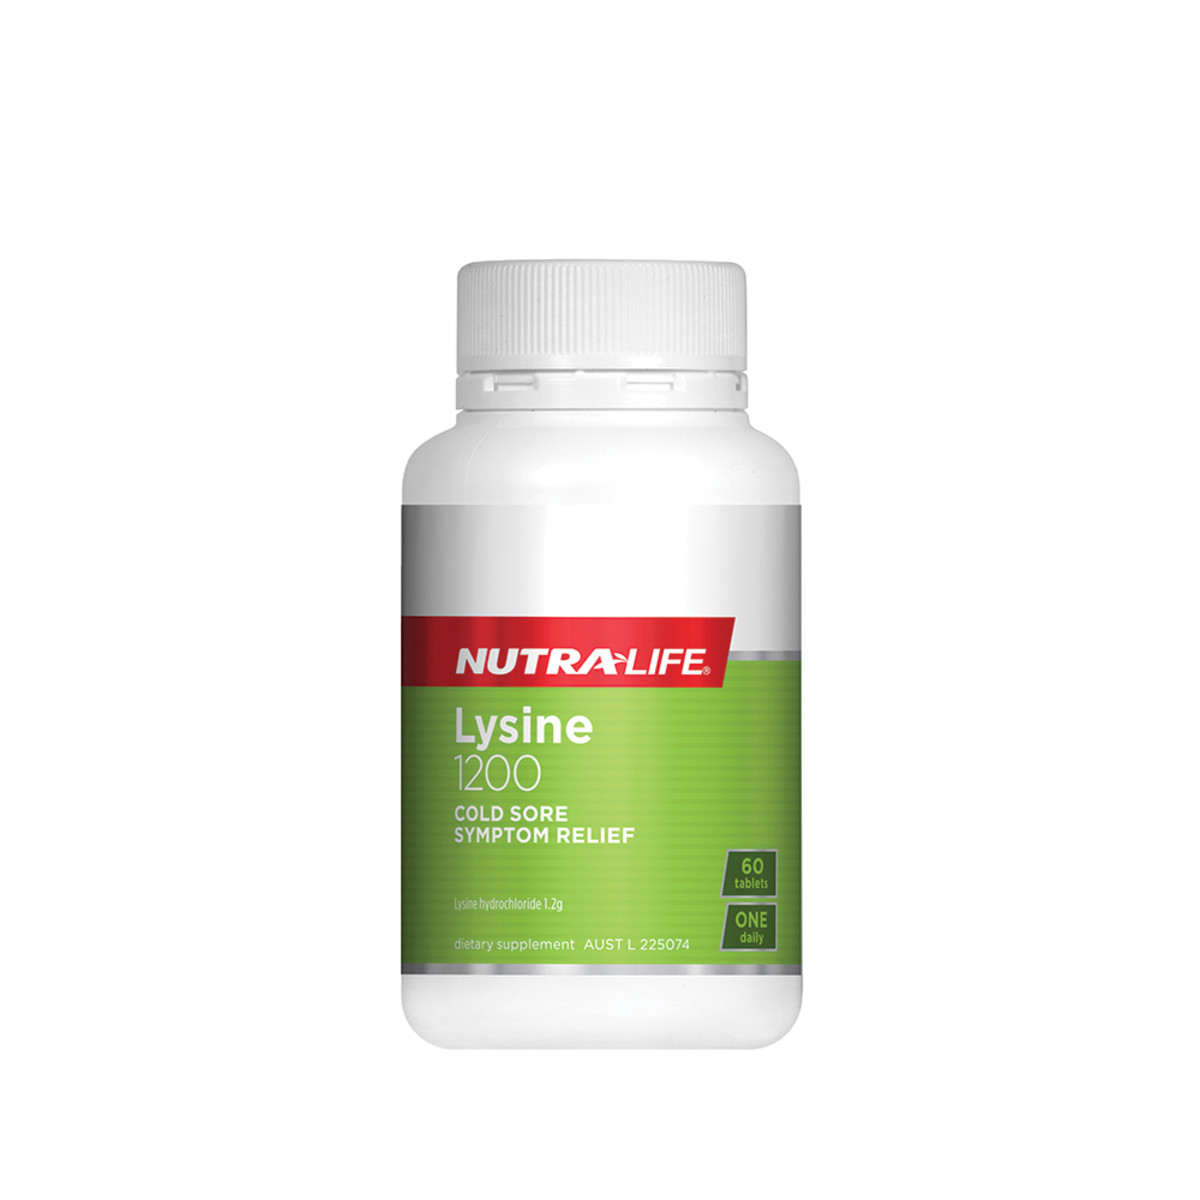 NUTRALIFE LYSINE 1200MG 60T